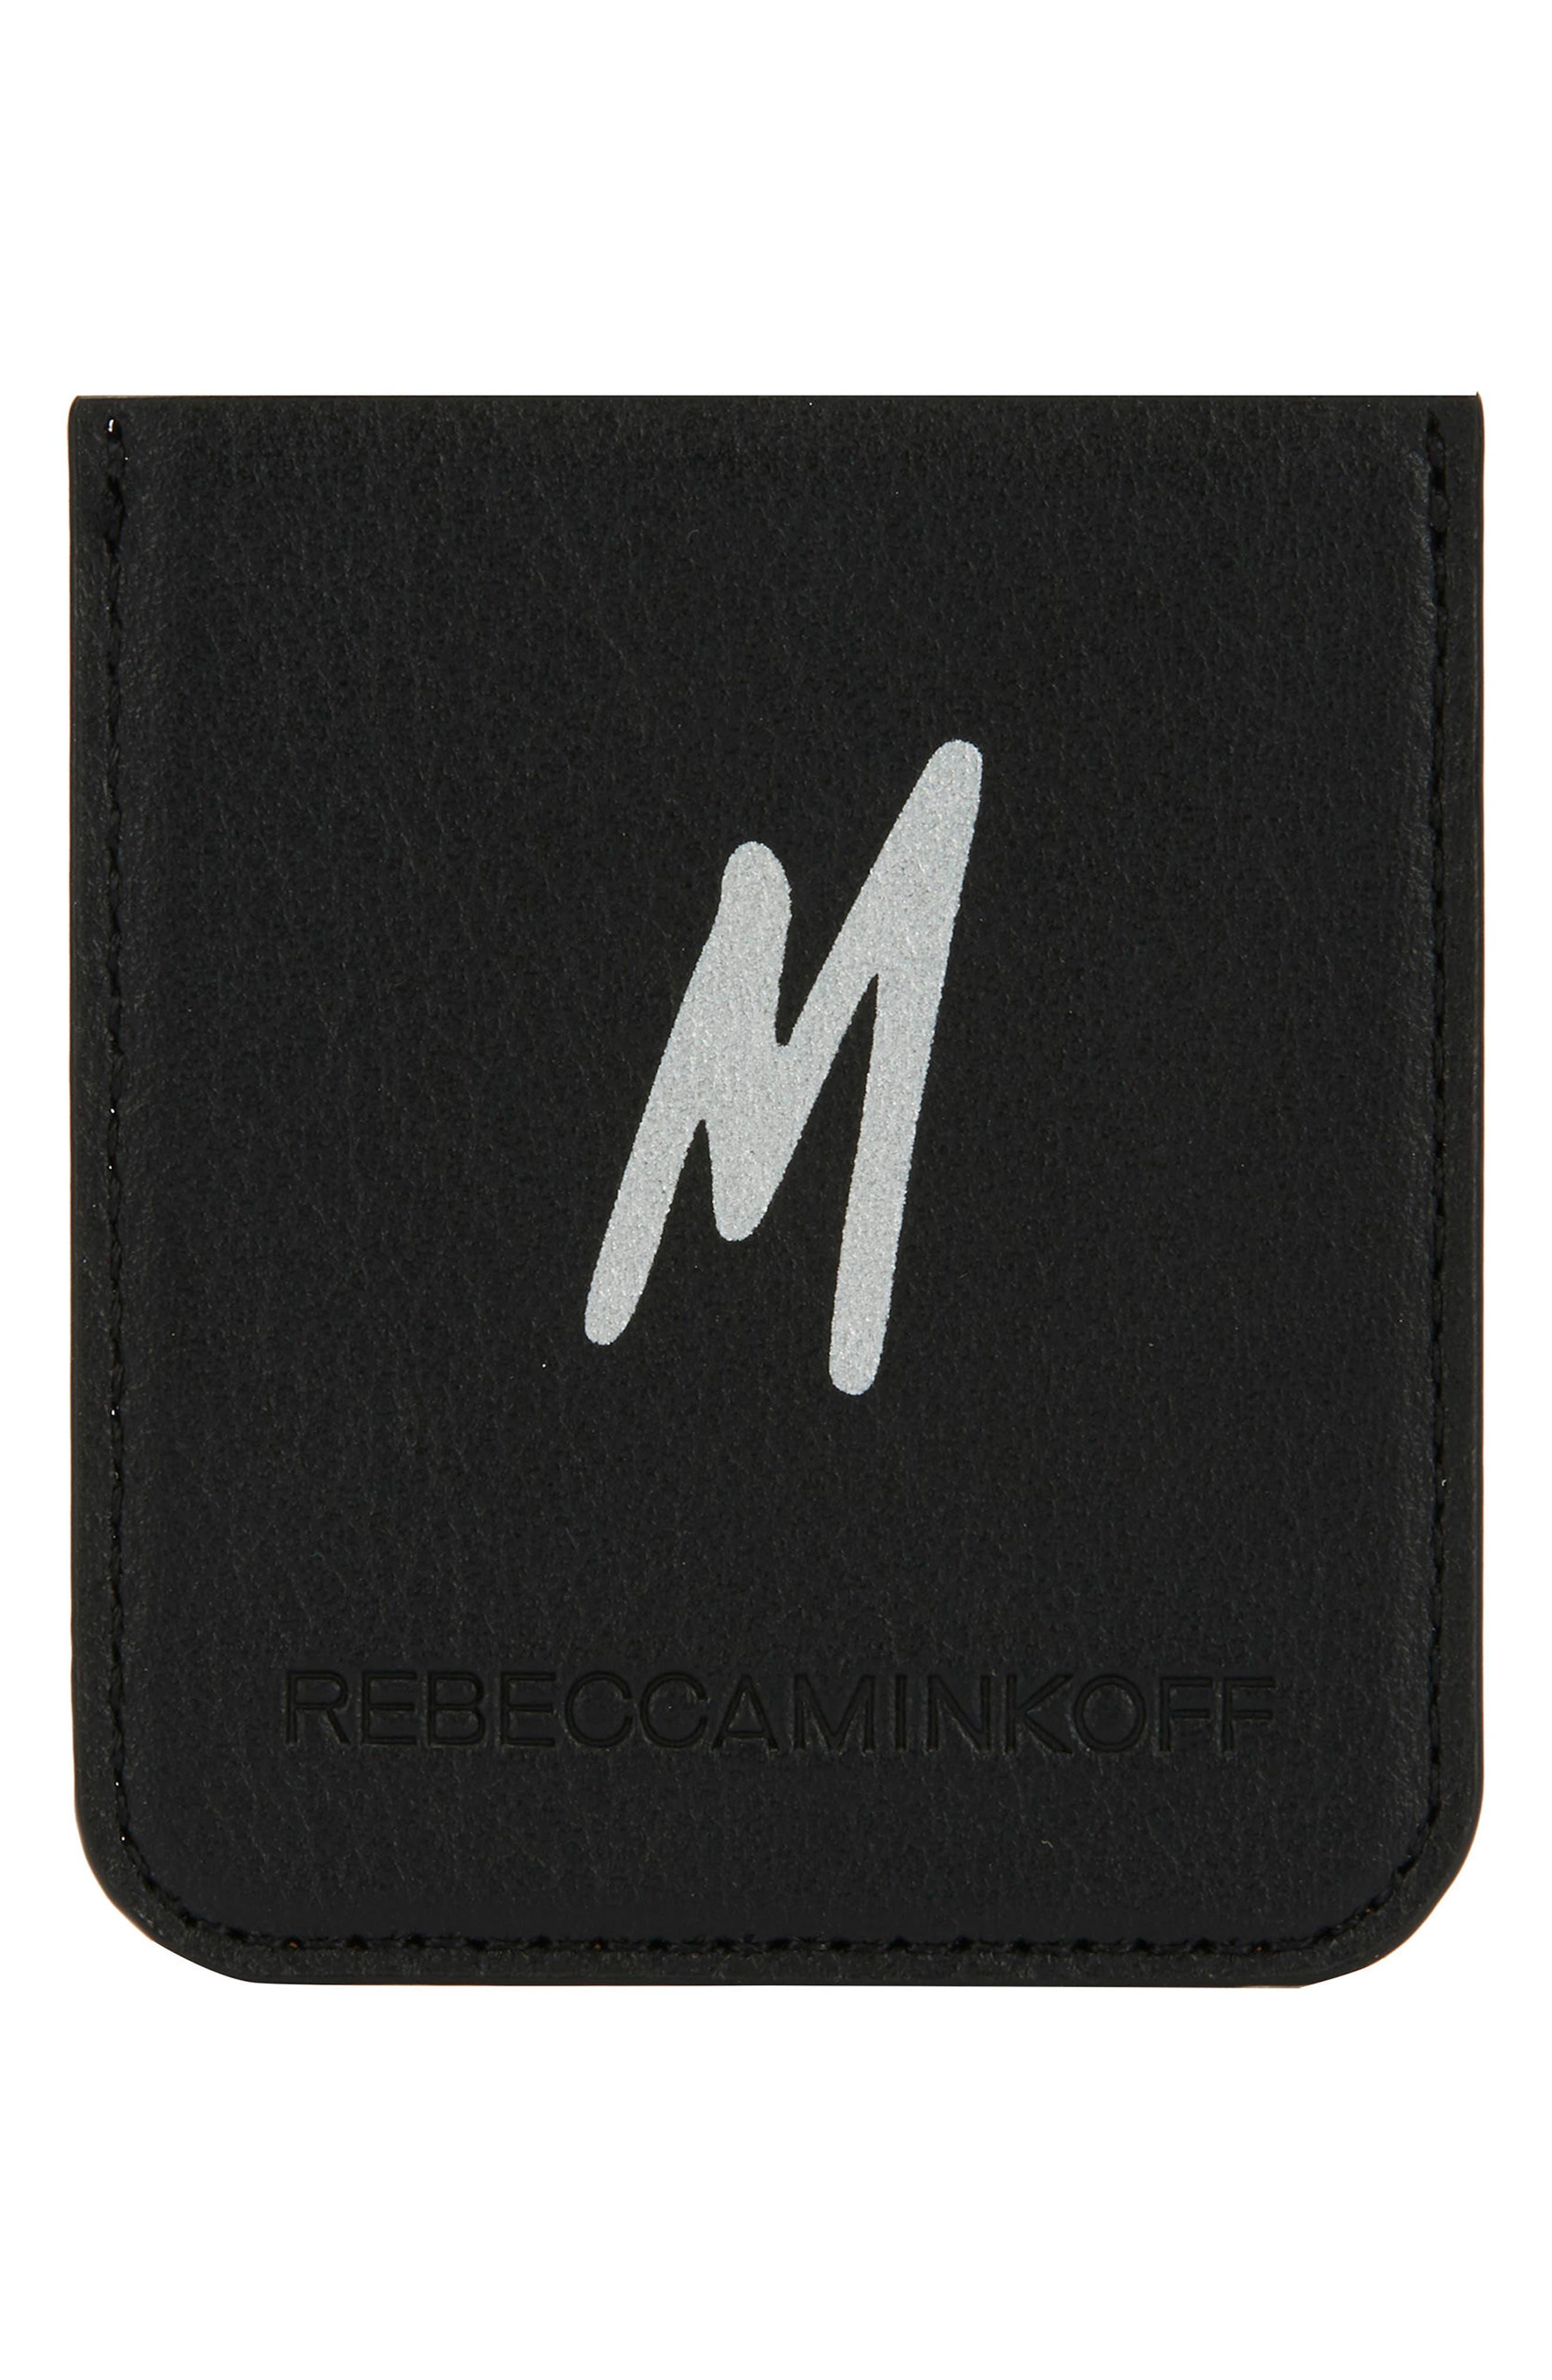 Initial Smartphone Sticker Pocket,                         Main,                         color, M - BLACK/ SILVER FOIL